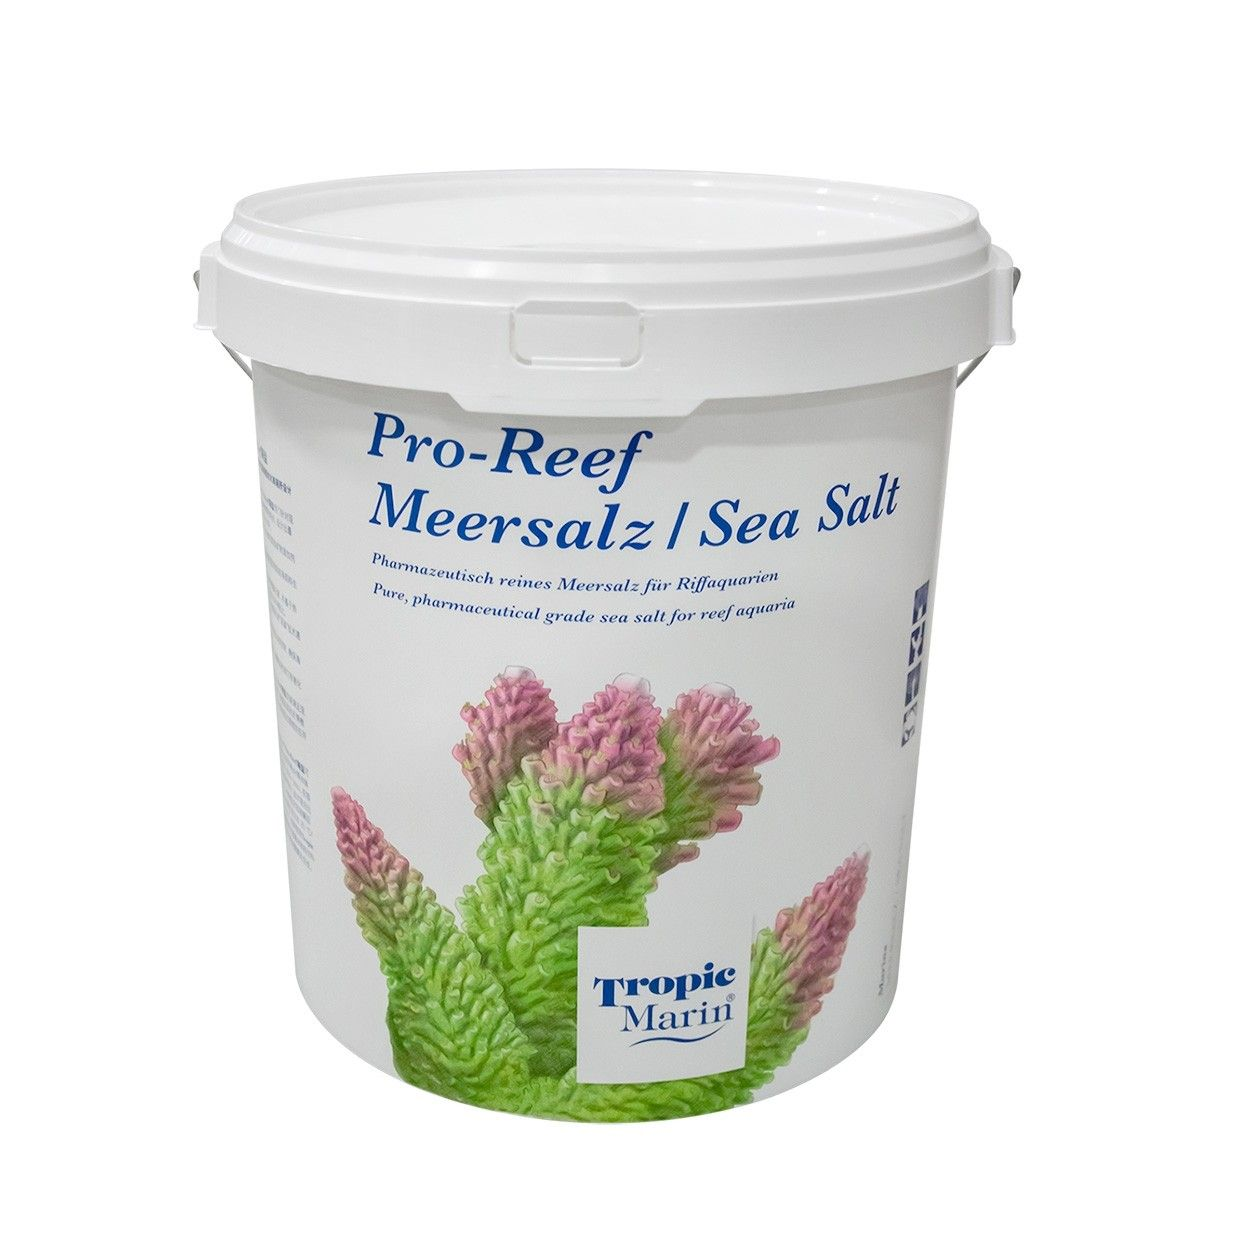 Tropic Marin Sal Pro - Reef 10kg 300 Litros